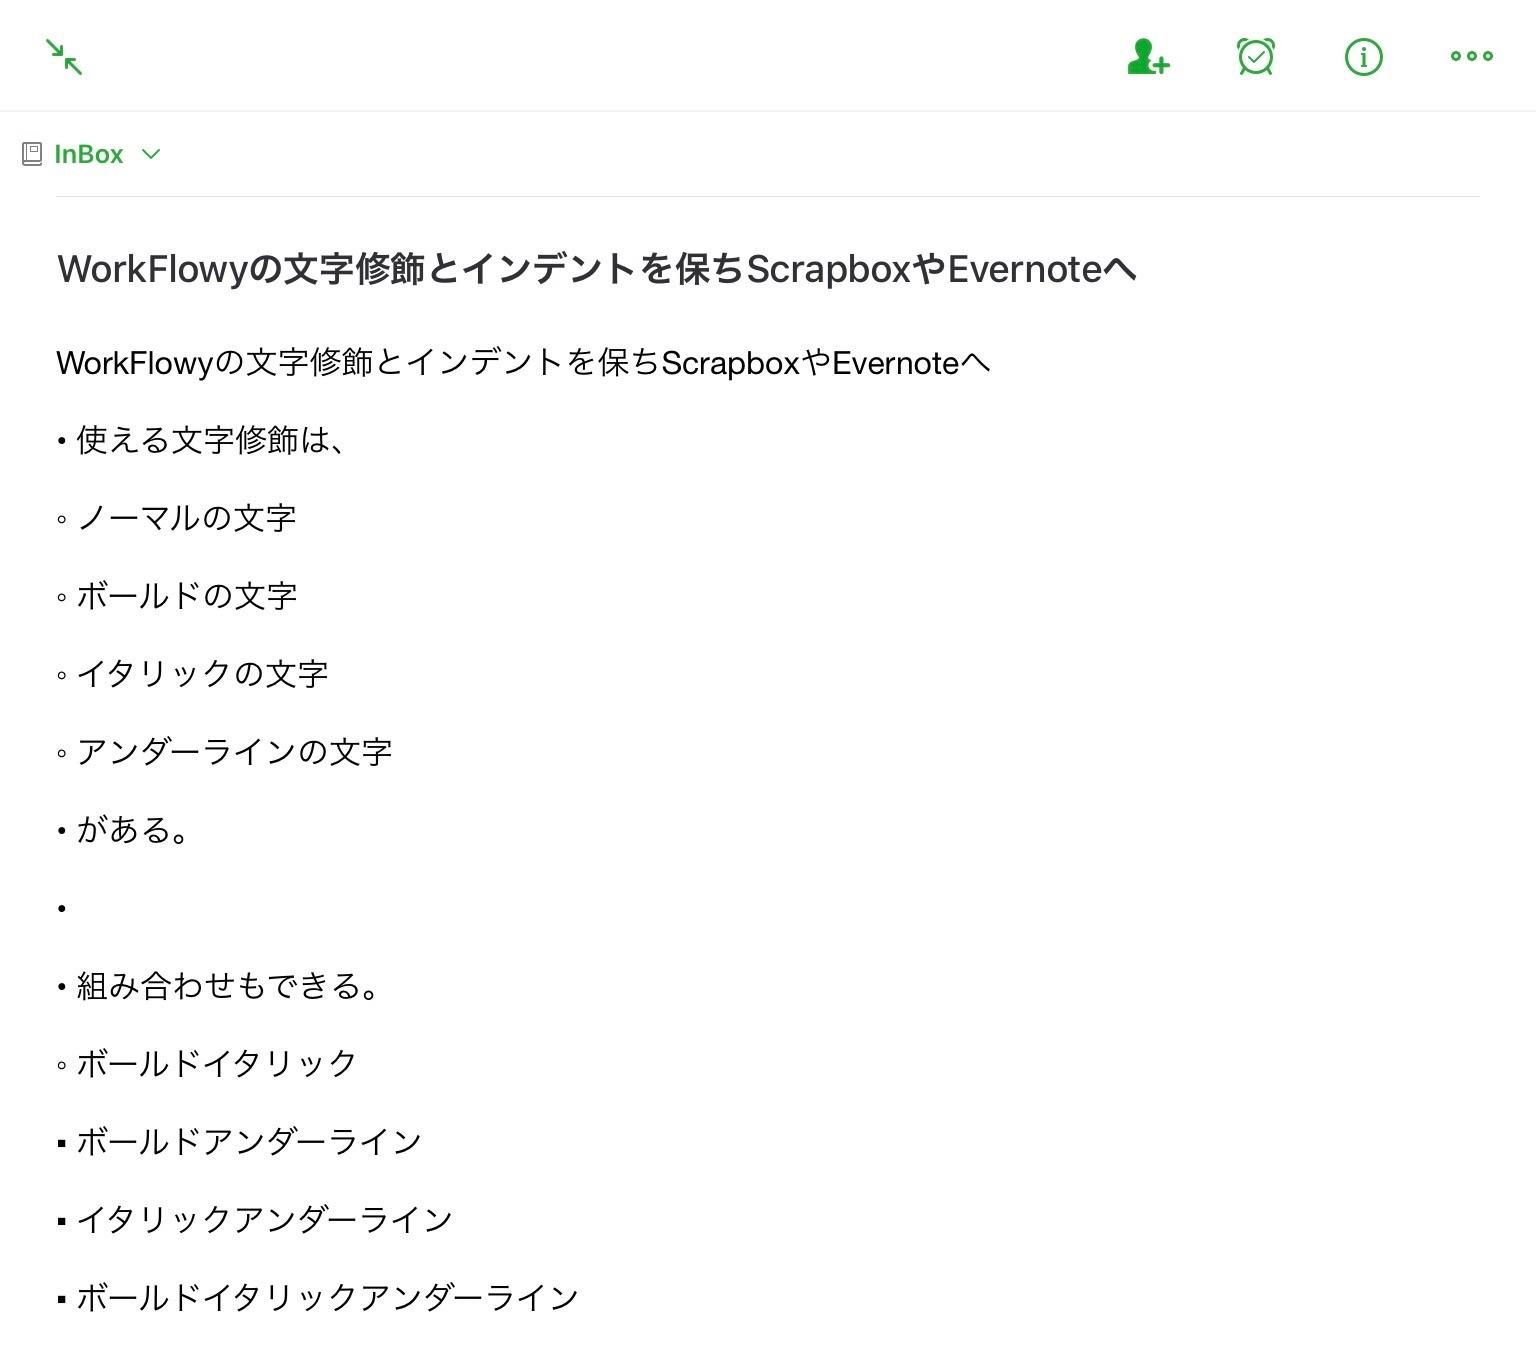 f:id:sorashima:20200731233012j:plain:w637